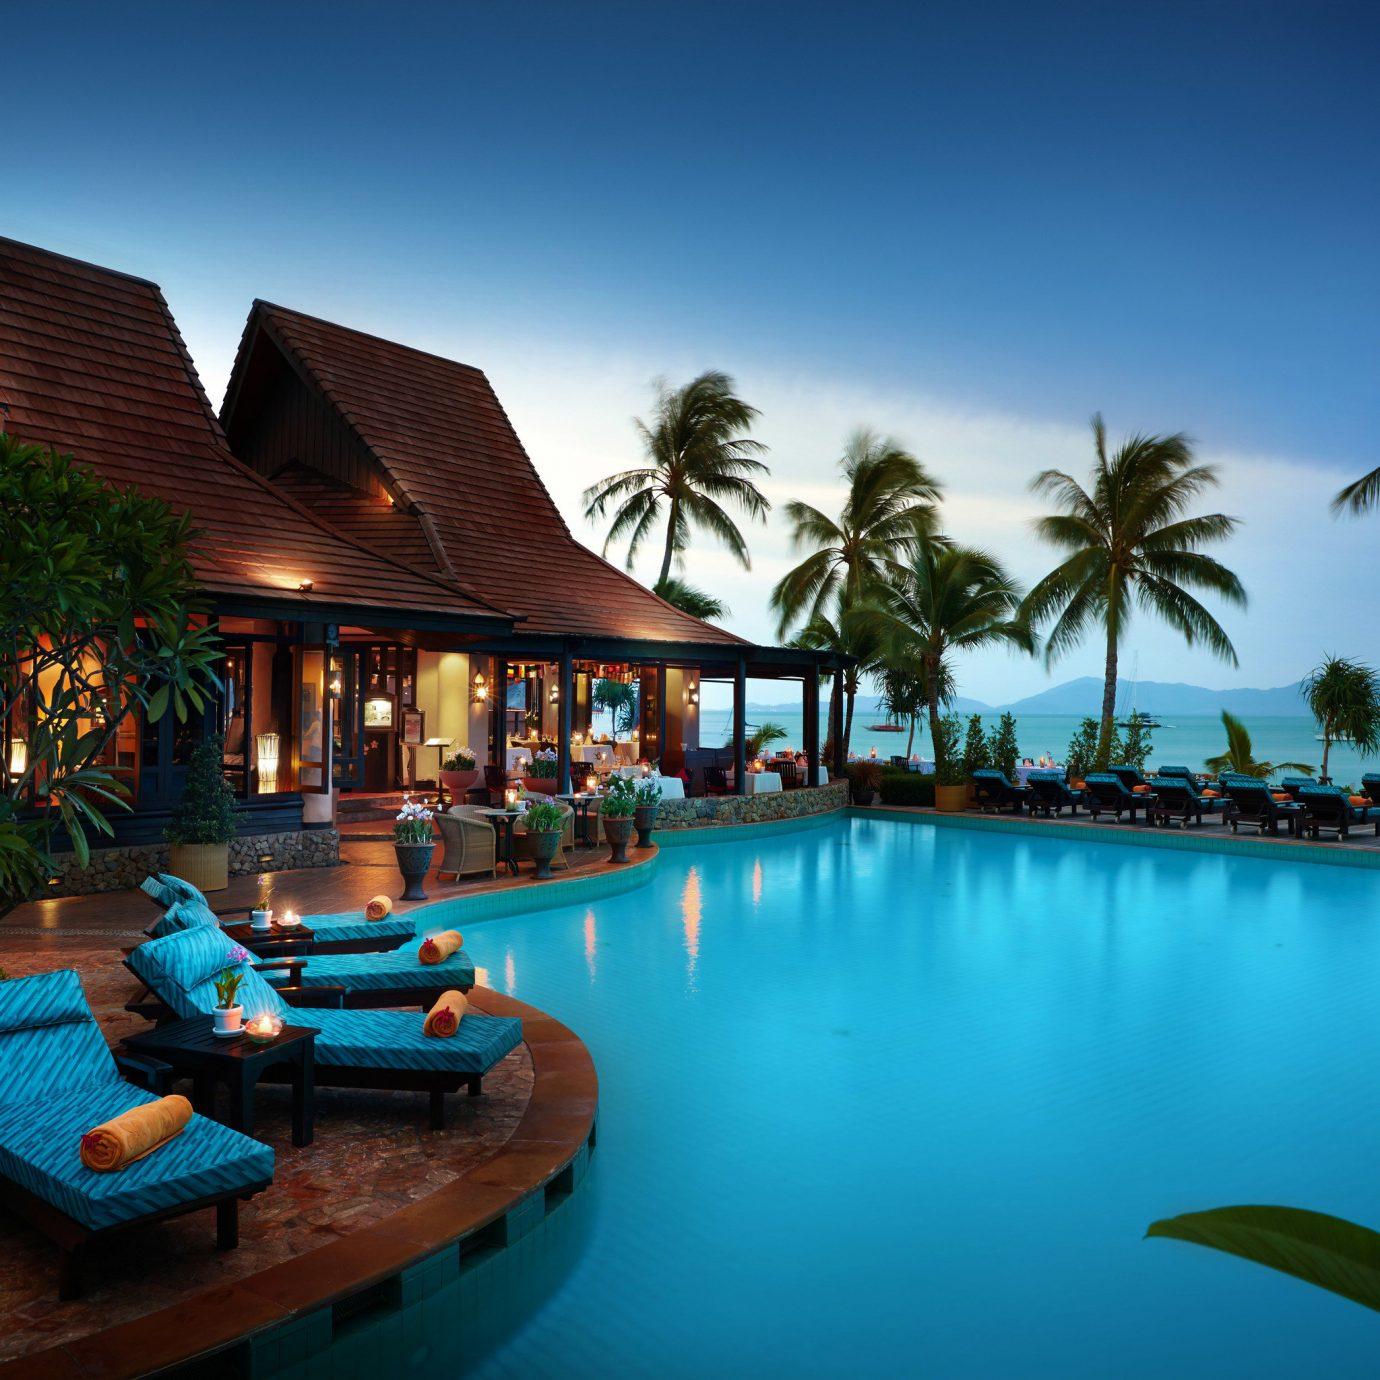 sky water swimming pool leisure Resort palm caribbean Sea arecales